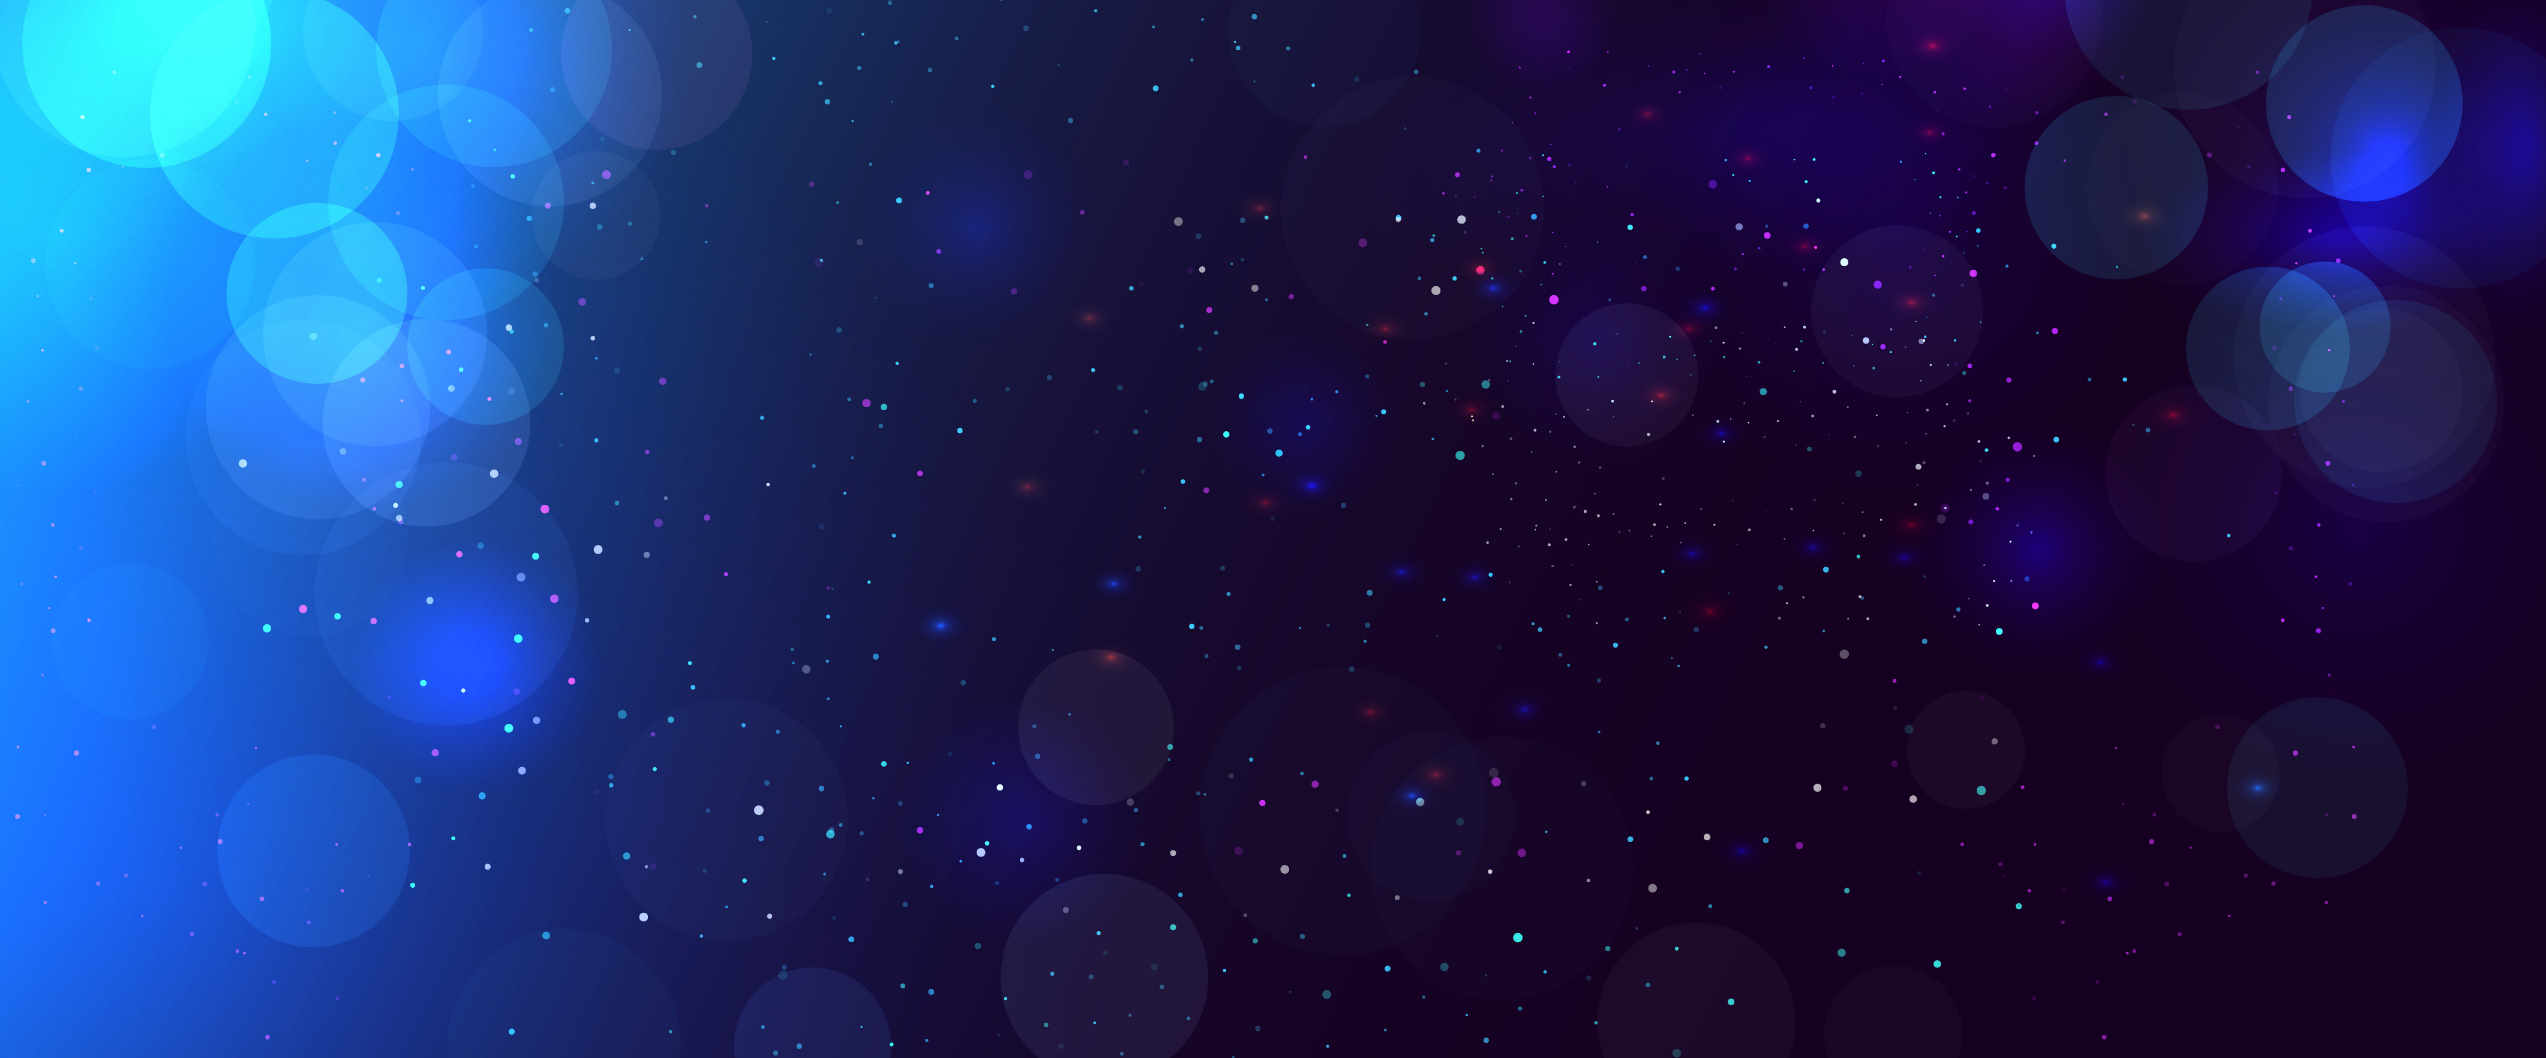 https://astrocycles.net/wp-content/uploads/blue-background-stars.jpg